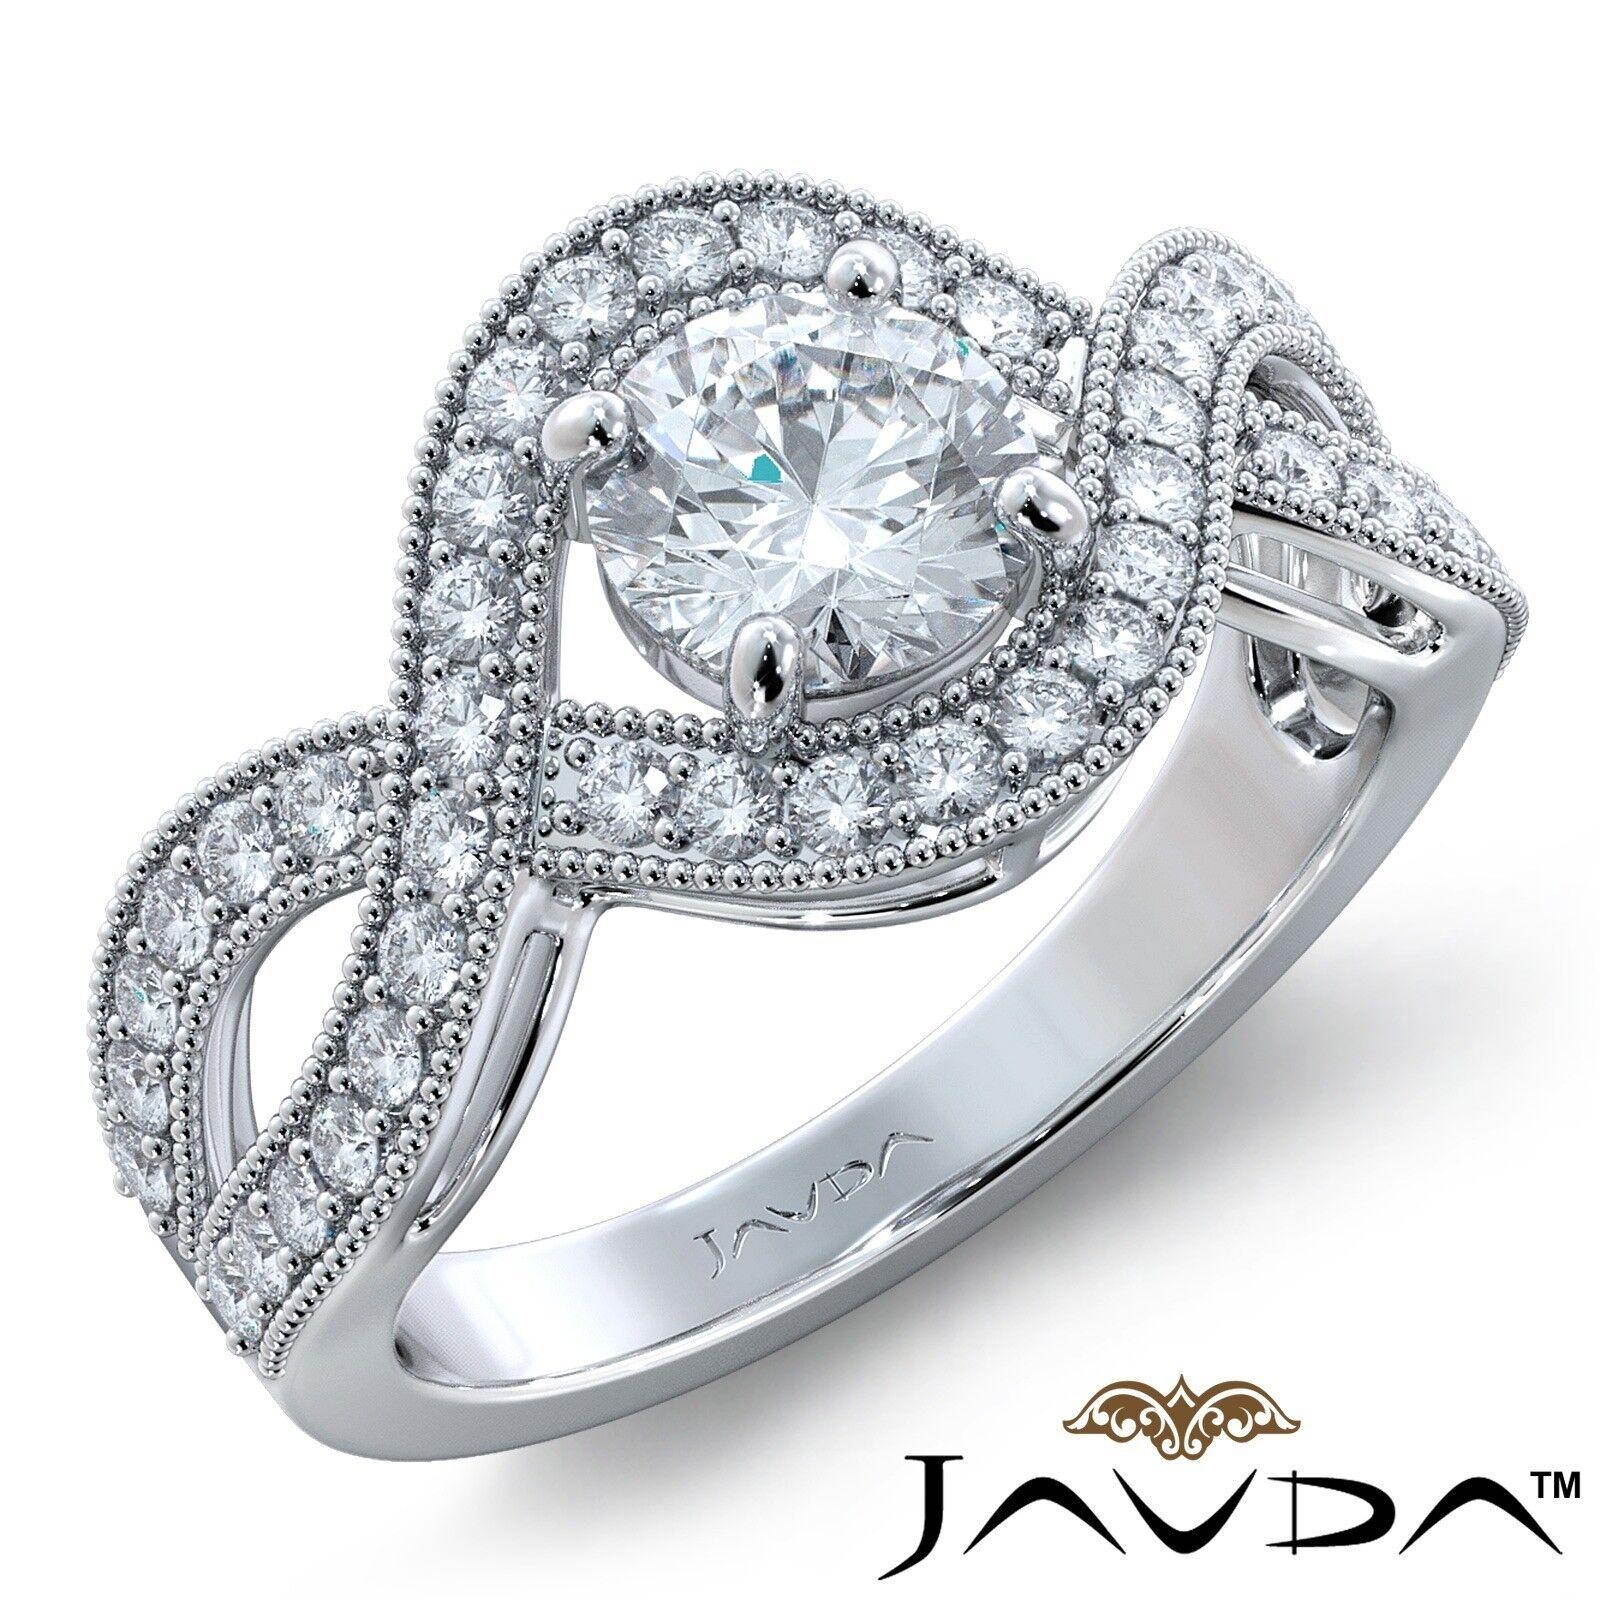 1.25ctw Milgrain Halo Accent Round Diamond Engagement Ring GIA E-VS2 White Gold